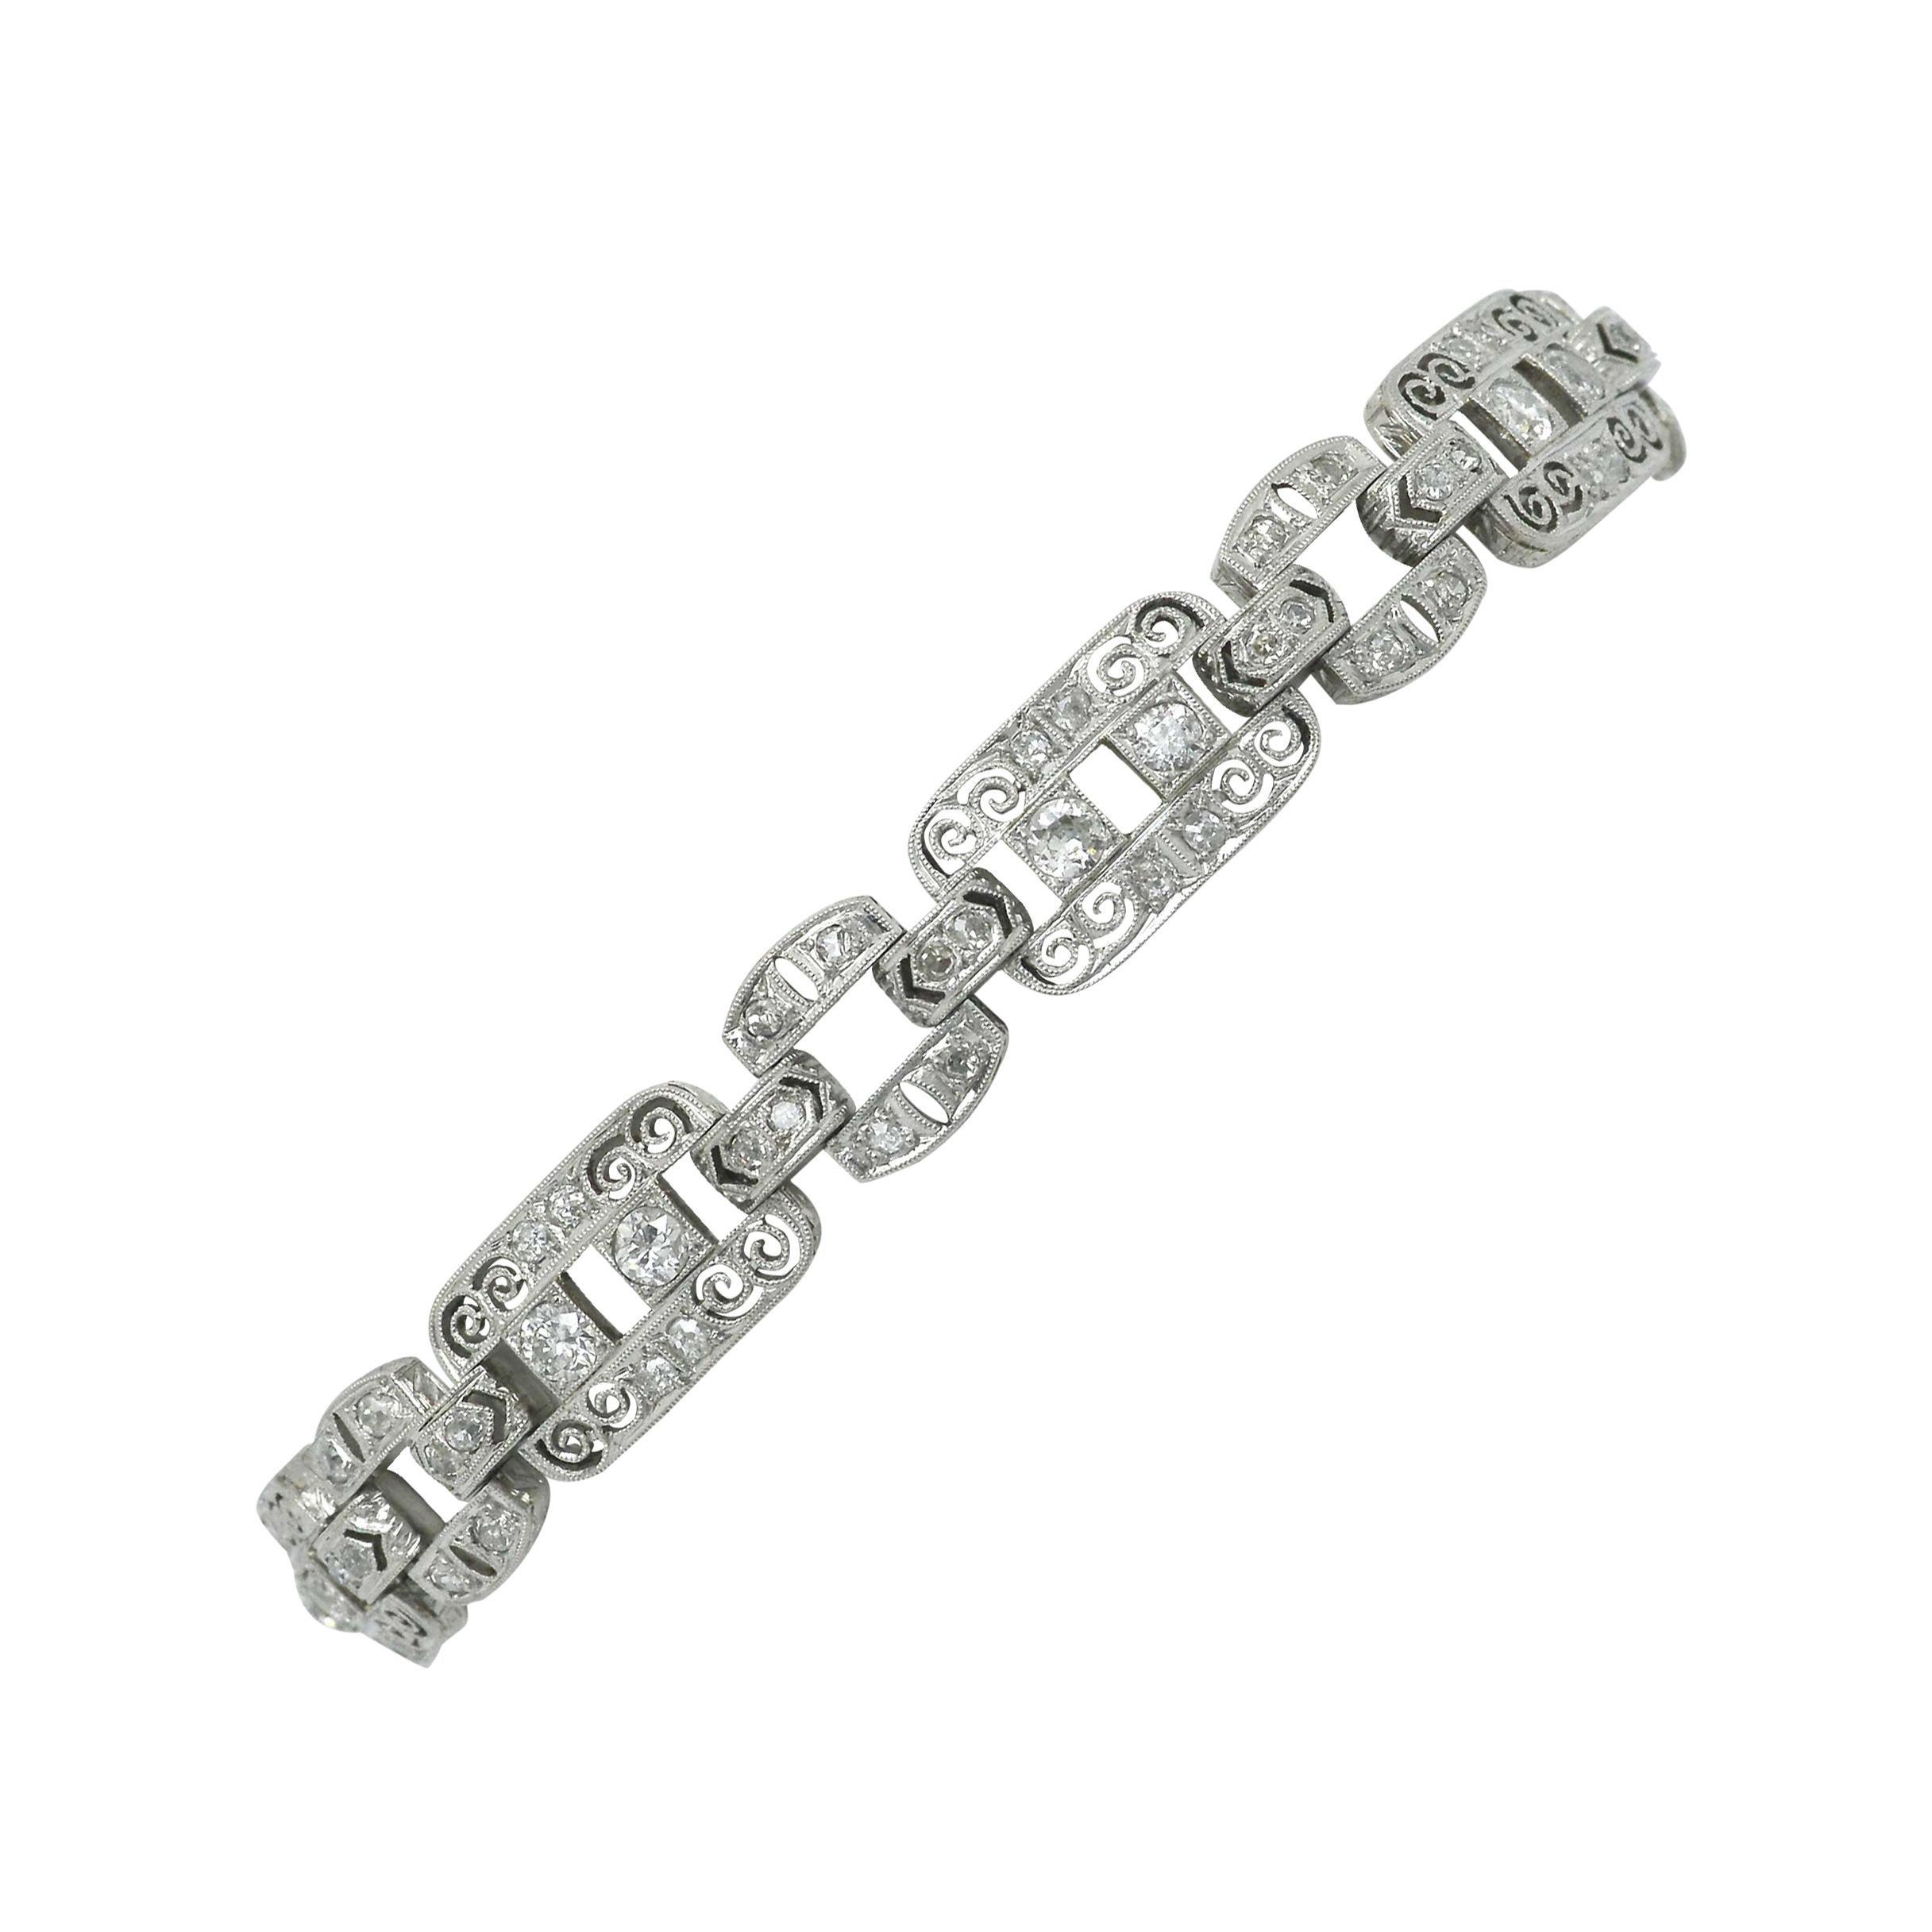 Art Deco Platinum Diamond Filigree Bracelet 1920s Edwardian Antique Wide Links